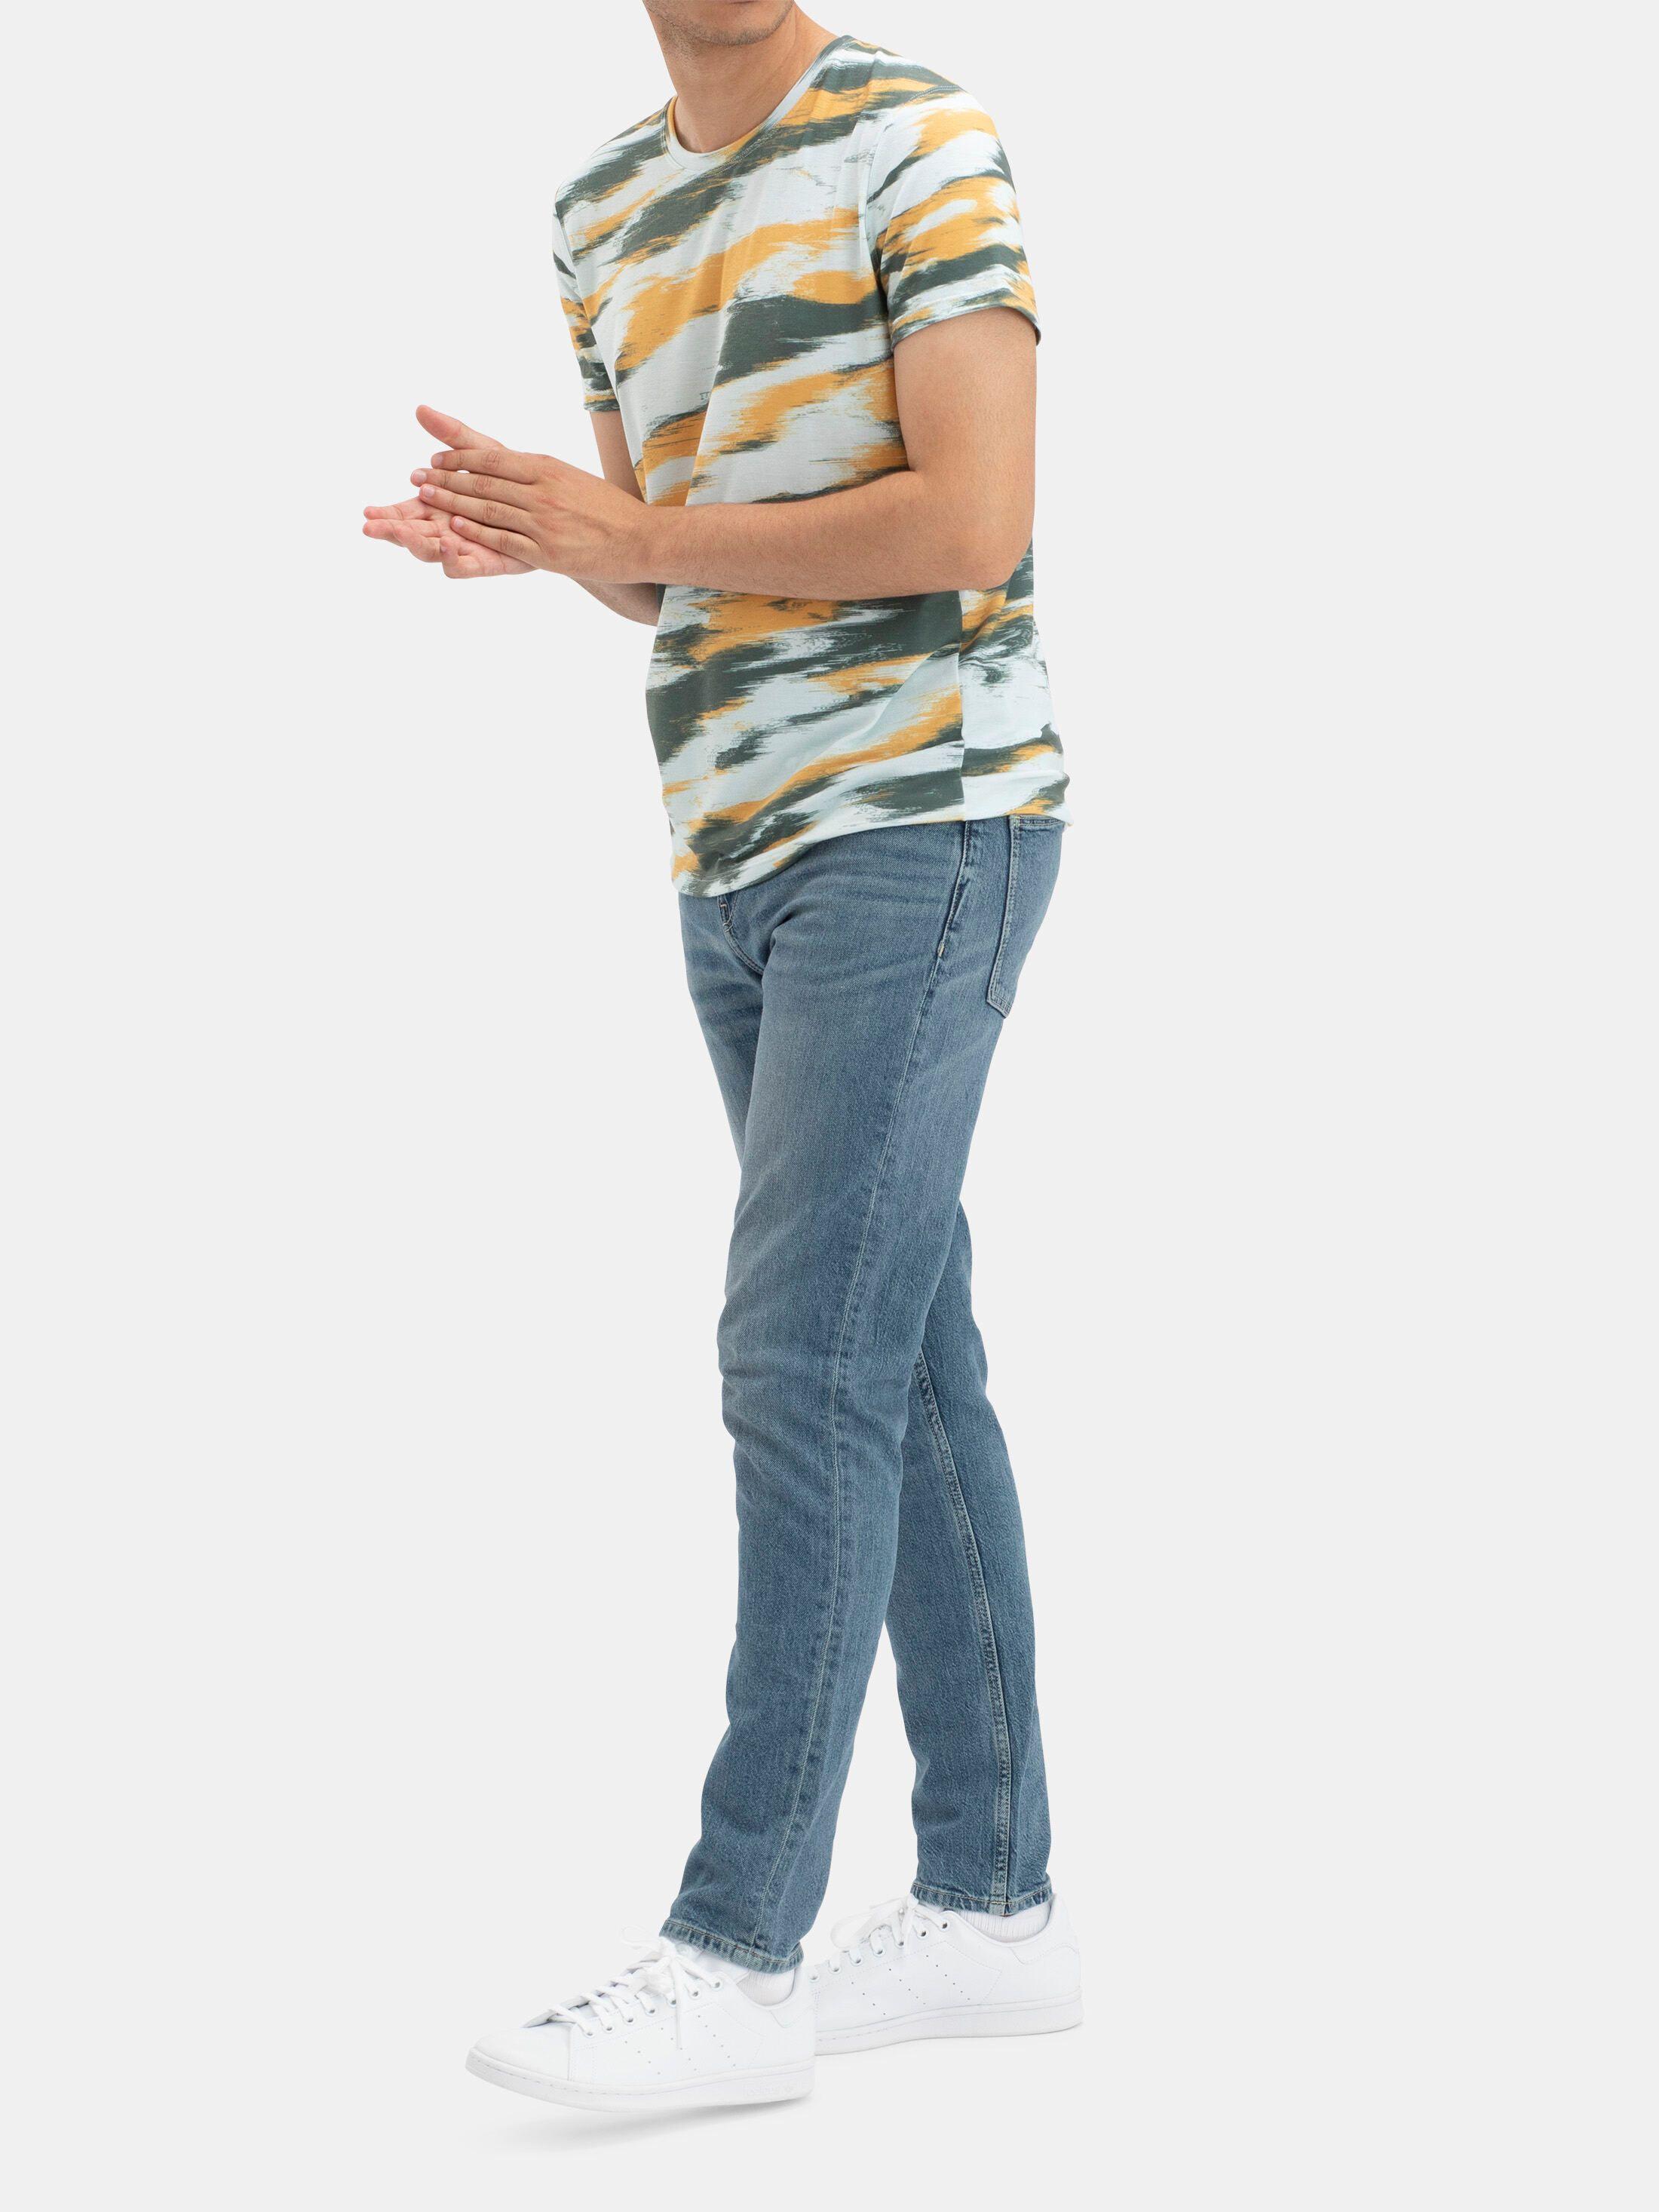 Men's Custom made Regular Fit T-Shirt